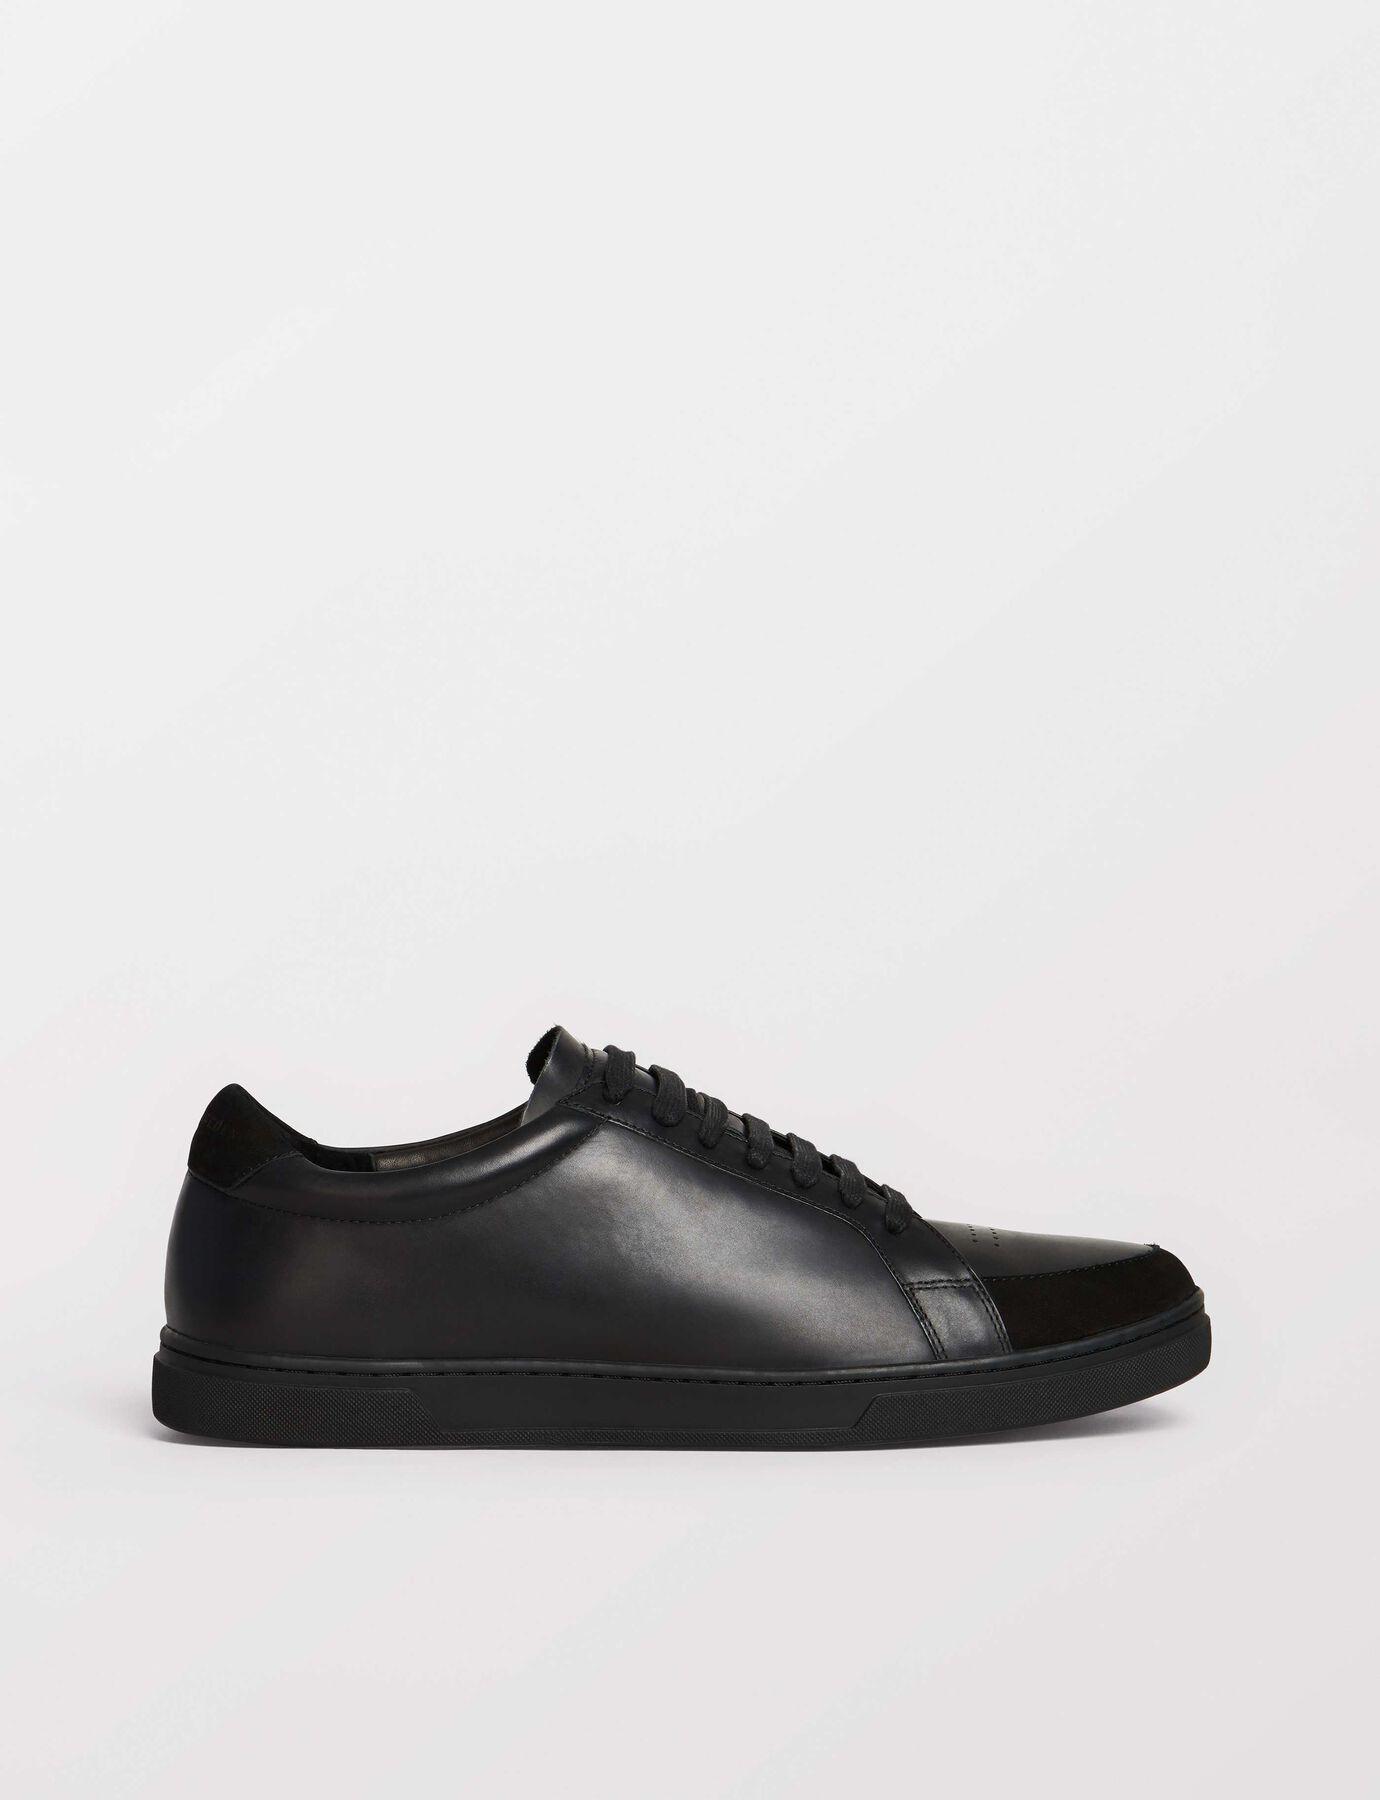 Arne sneakers in Black from Tiger of Sweden